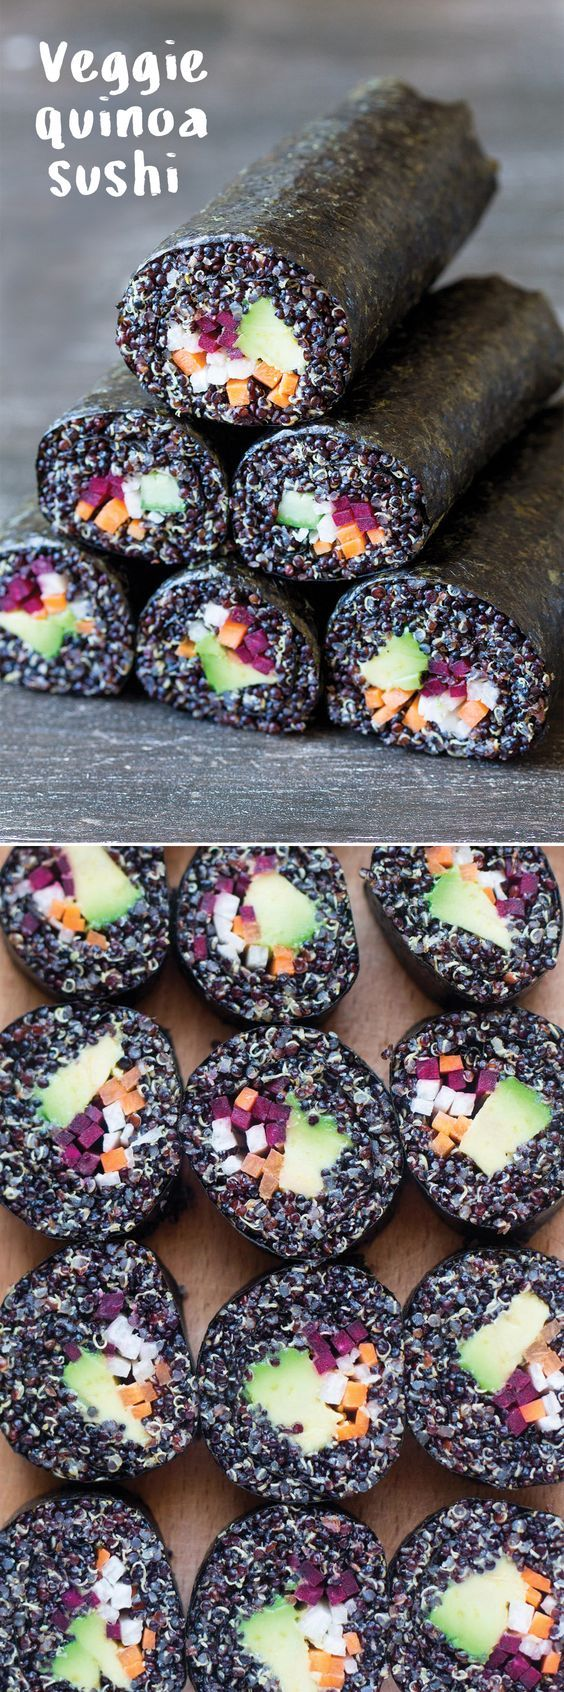 Something different to try! Veggie quinoa sushi